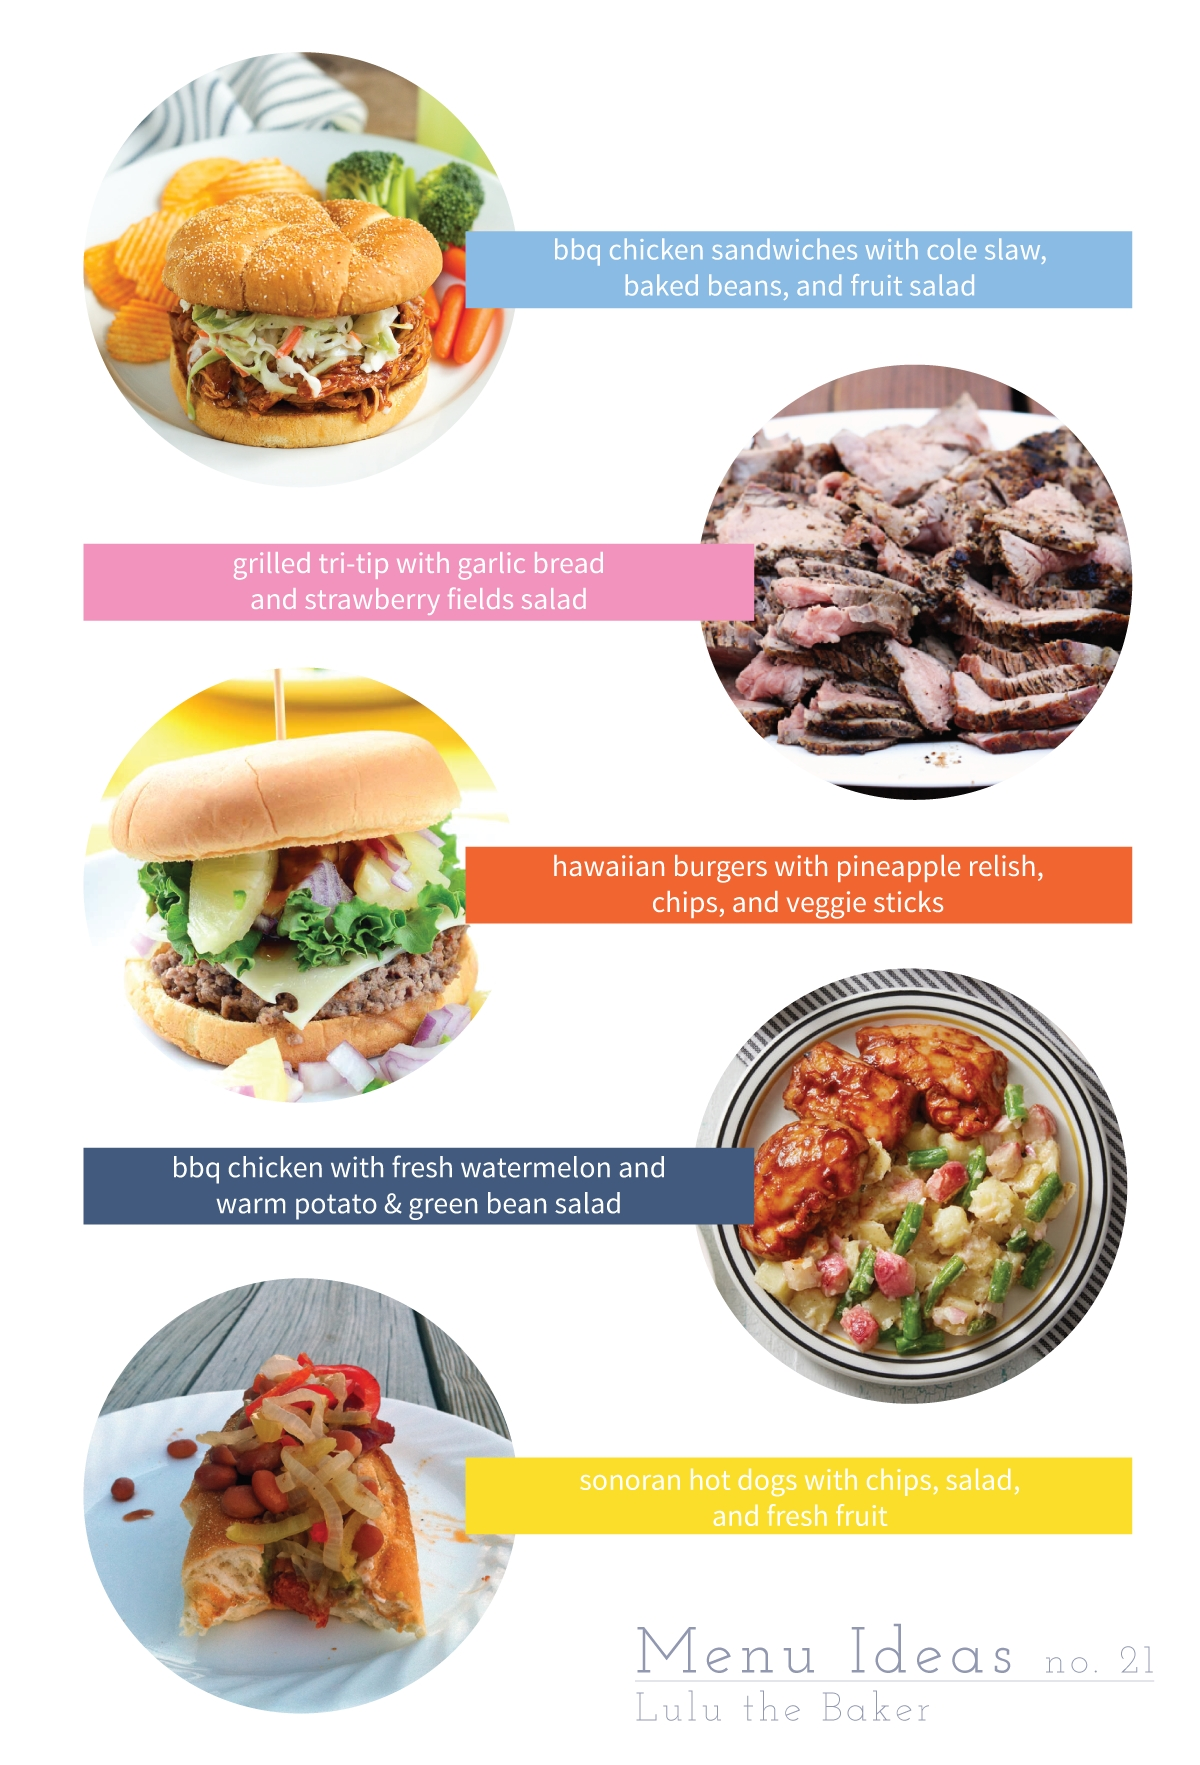 10 Lovely 4Th Of July Bbq Menu Ideas menu ideas 21 fourth of july favorites lulu the baker 2 2020